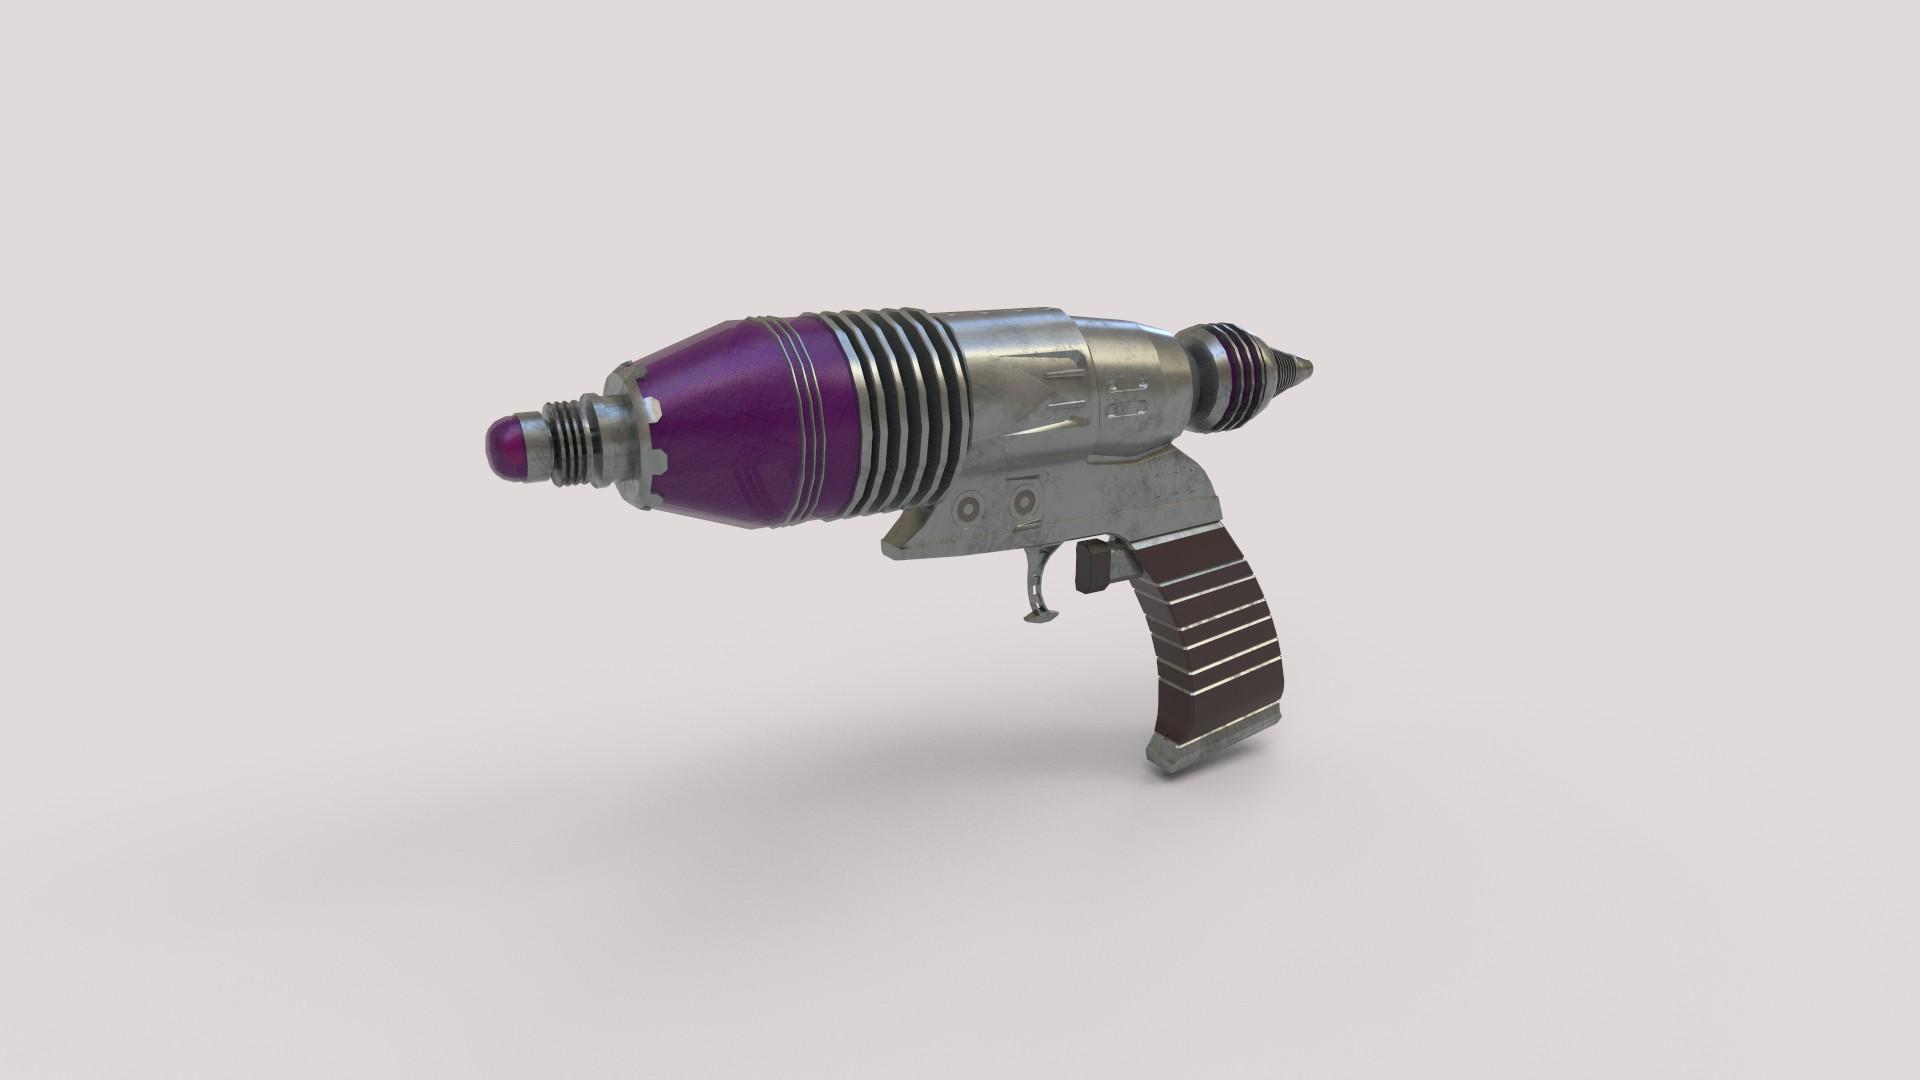 Volta gun #2